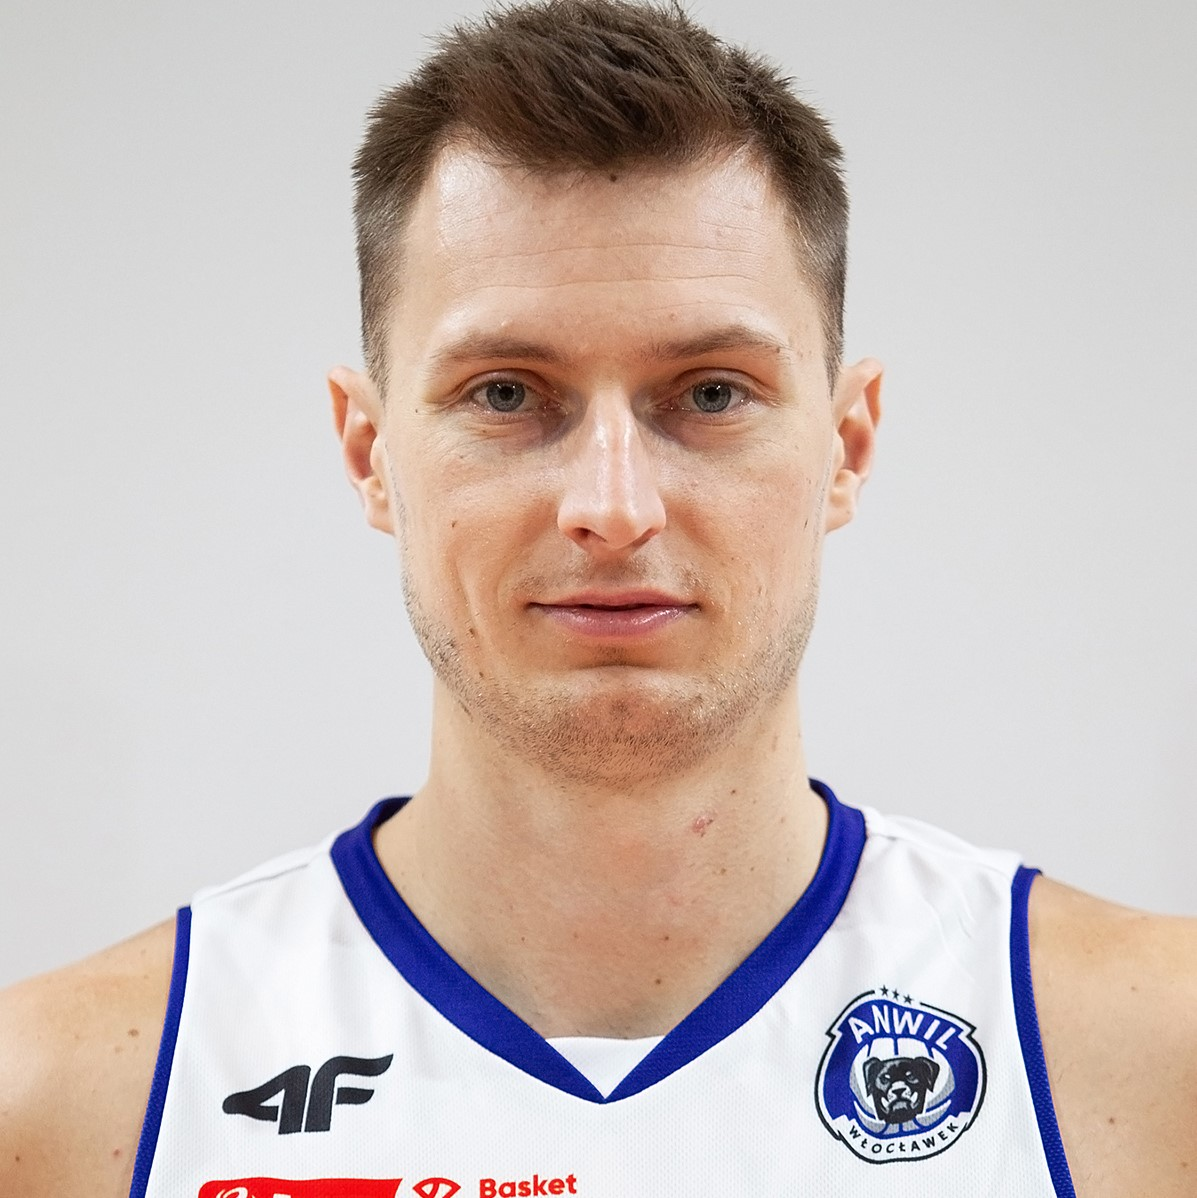 Sebastian Kowalczyk